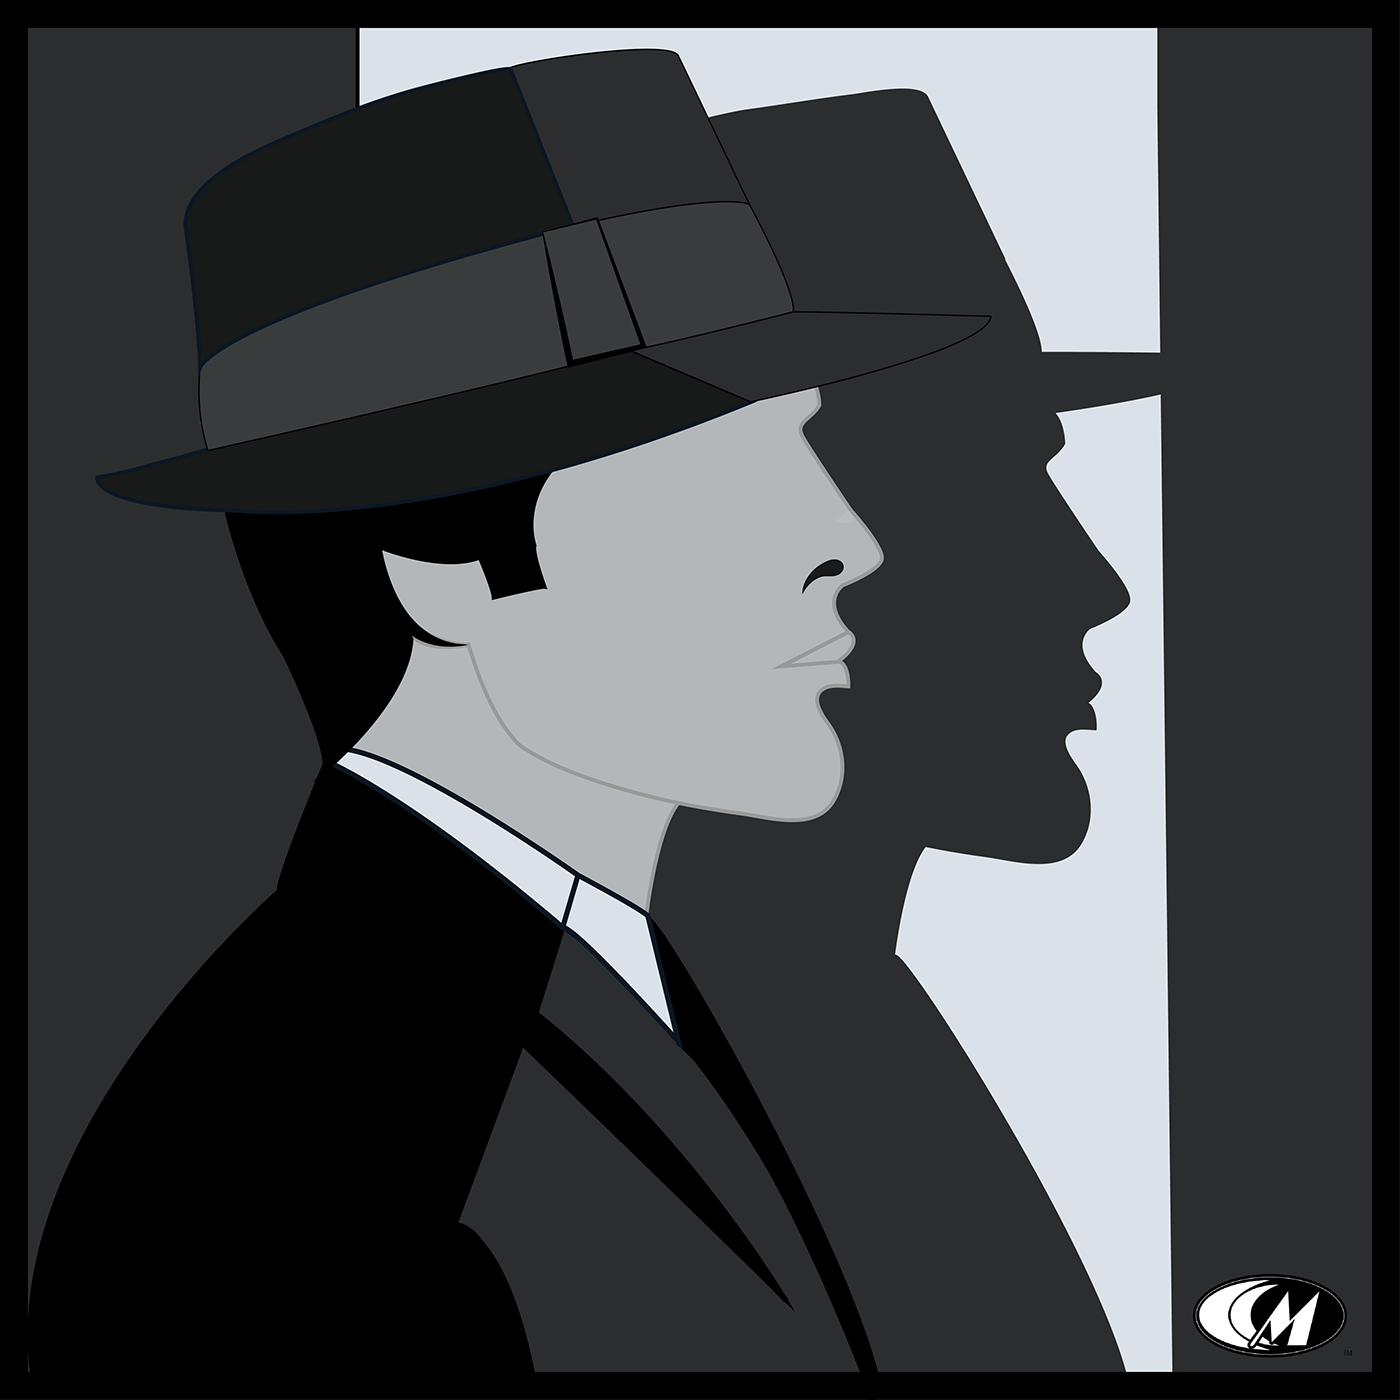 gentleman men's fashion Fashion  art ILLUSTRATION  Classic suit and tie